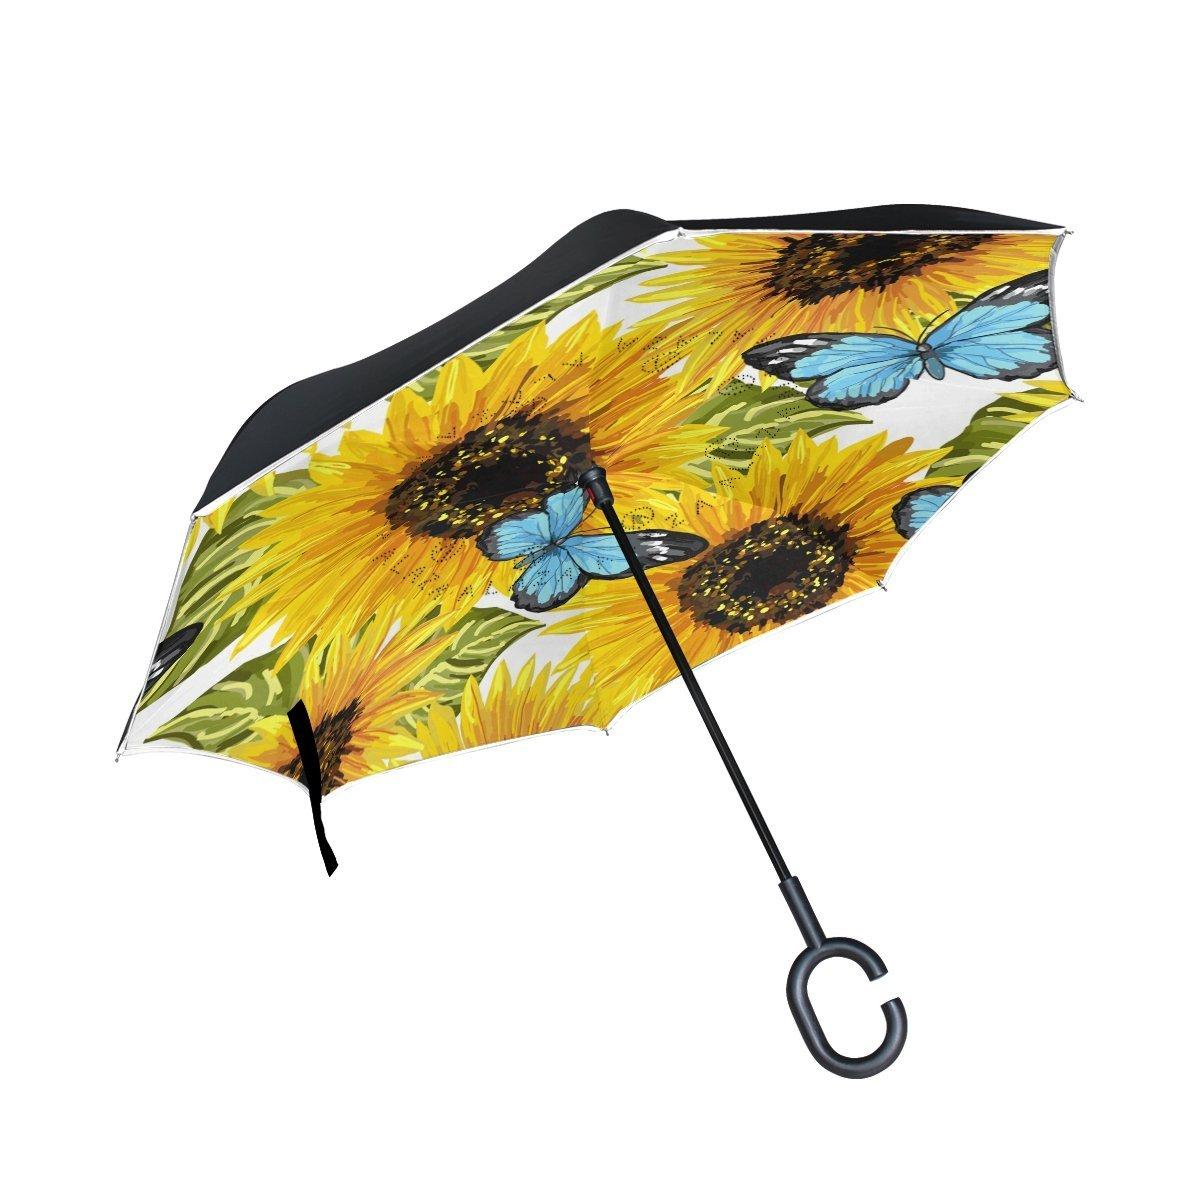 hengpai パイナップル 逆さ逆さ傘 車 ユニグー 防風 UV耐性 二層 女性用  マルチ4 B07G1F7QYB